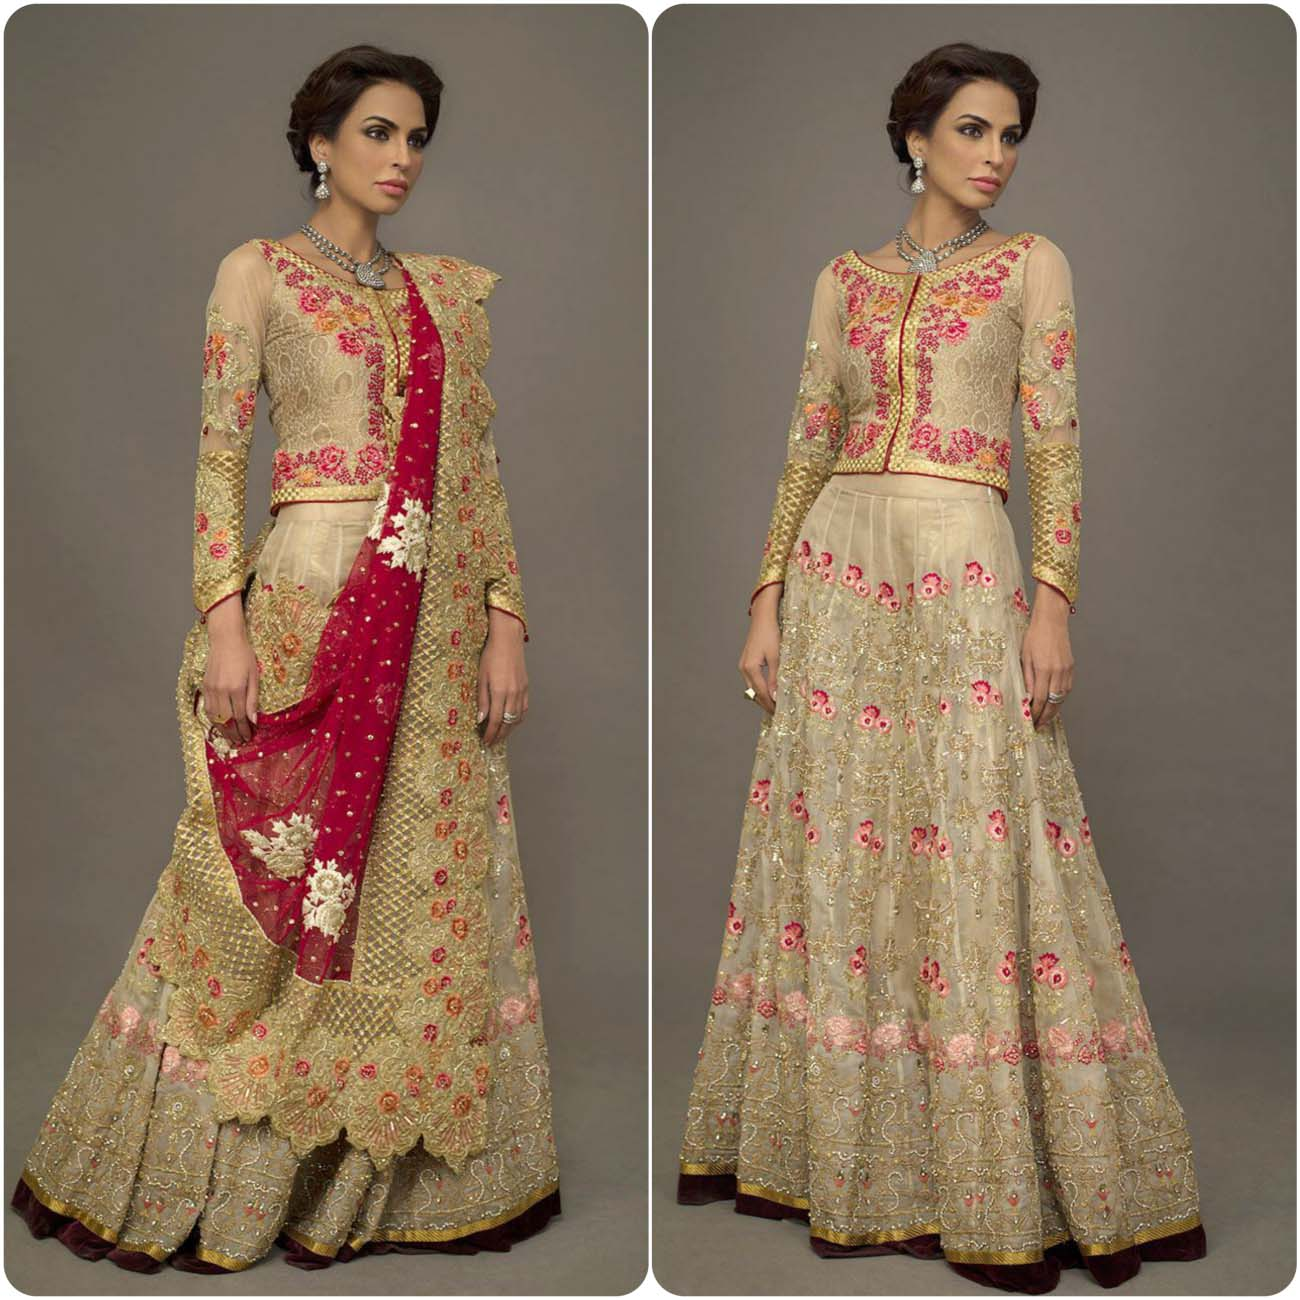 Deepak perwani Wedding Dresses Collection Fo Women 2016-2017...styloplanet (4)